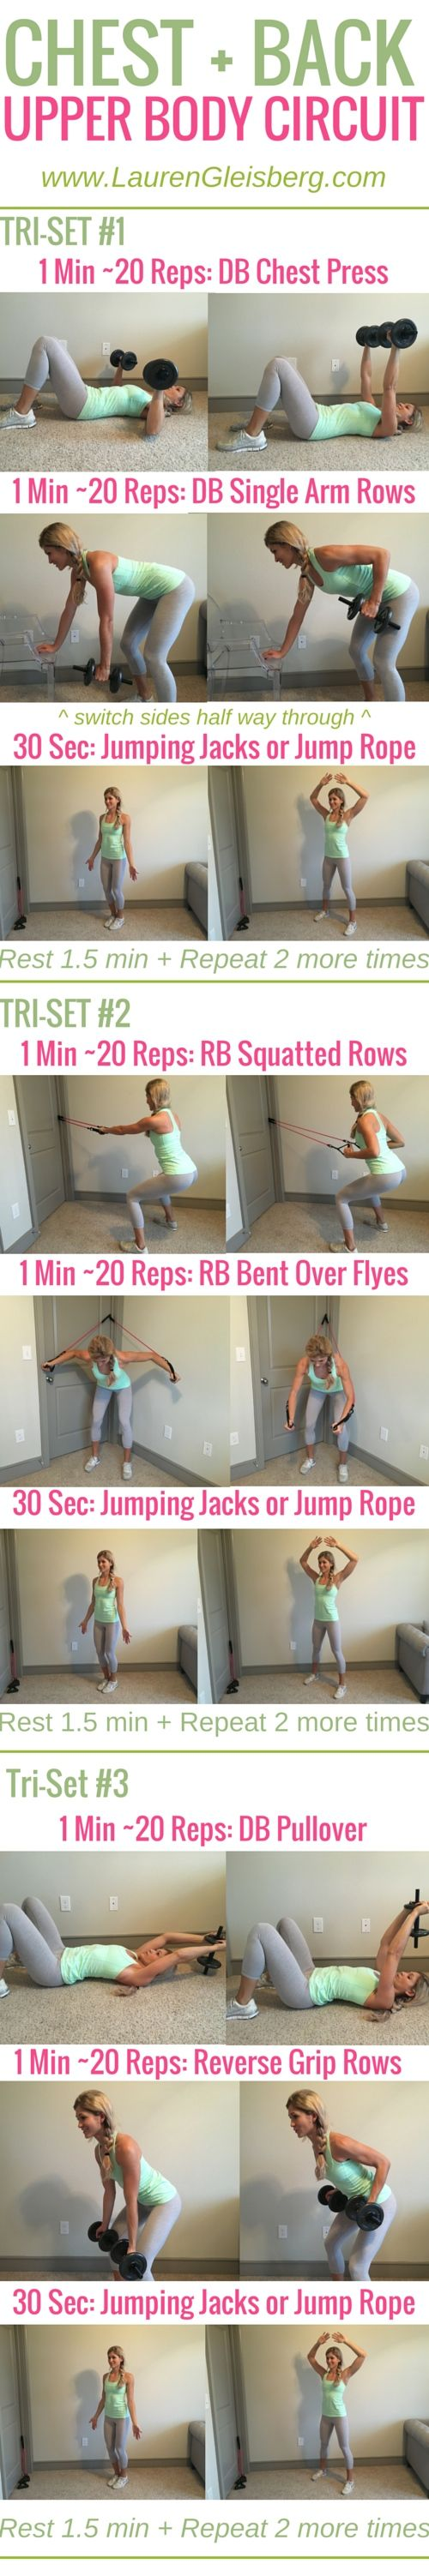 Week 2 Day 5   Home Version   Chest + Back Upper Body Circuit   #LGFitmas Lauren Gleisberg